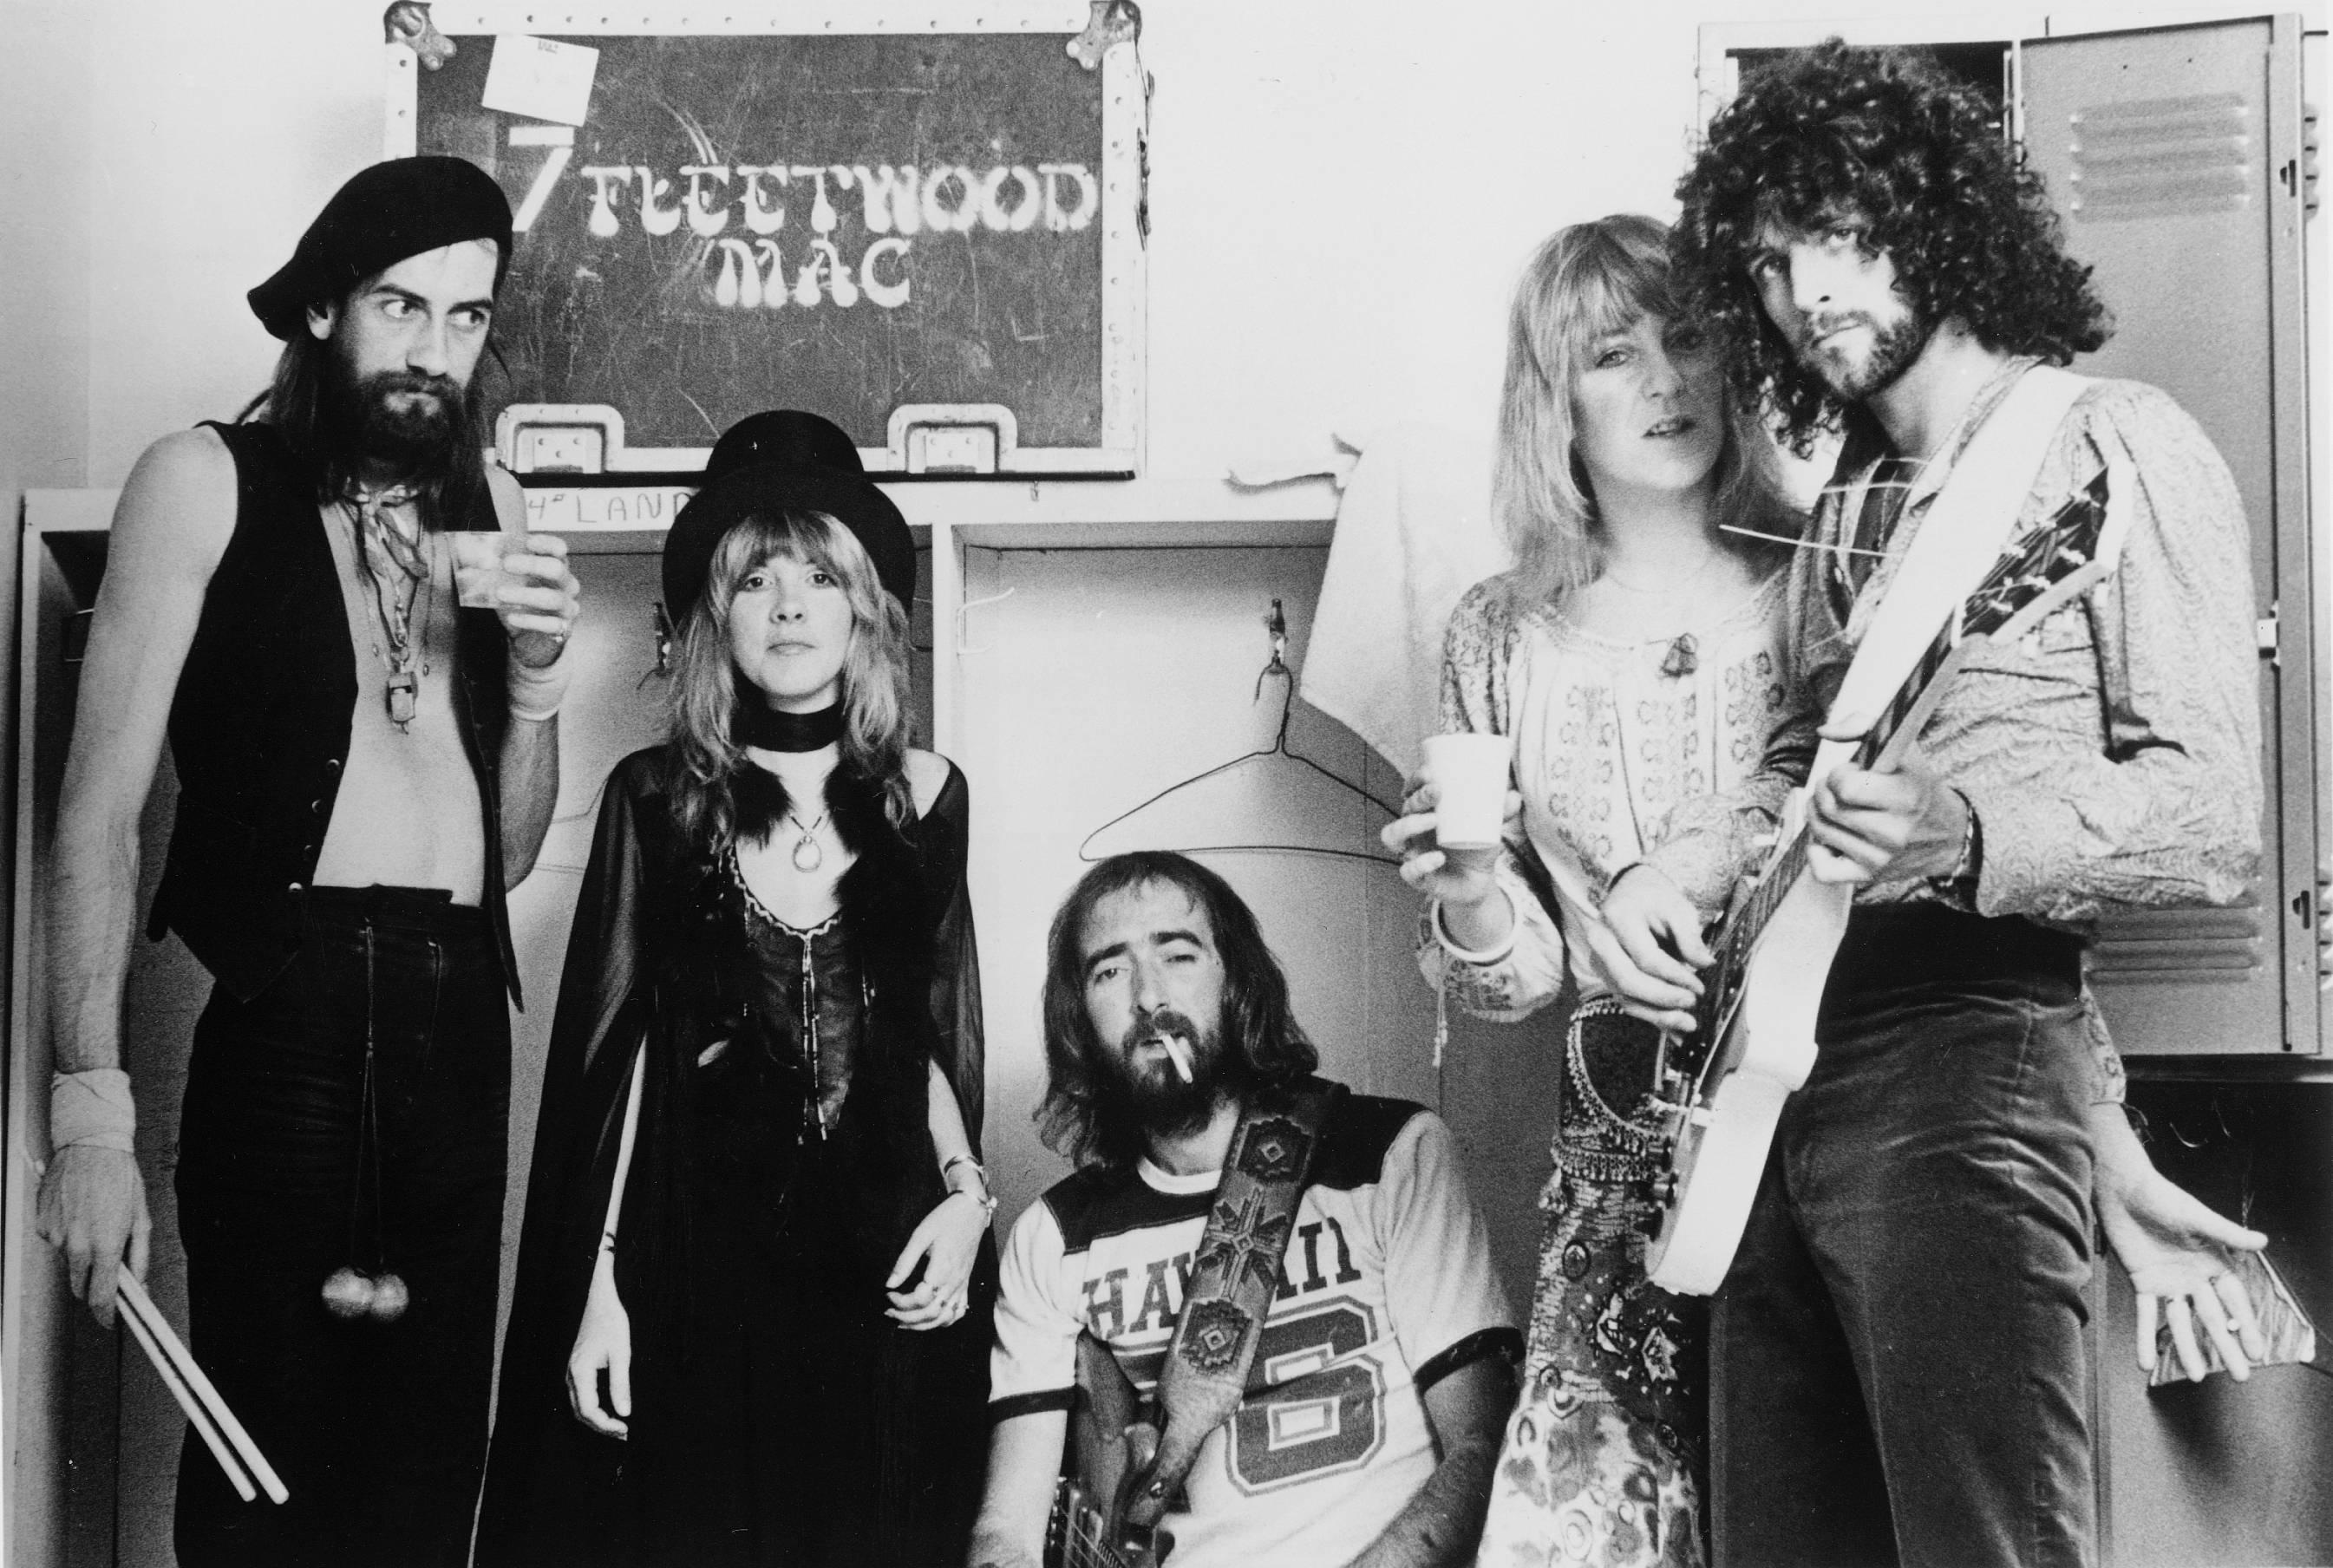 Fleetwood Mac Live 2013 Tour - image 3 - student project